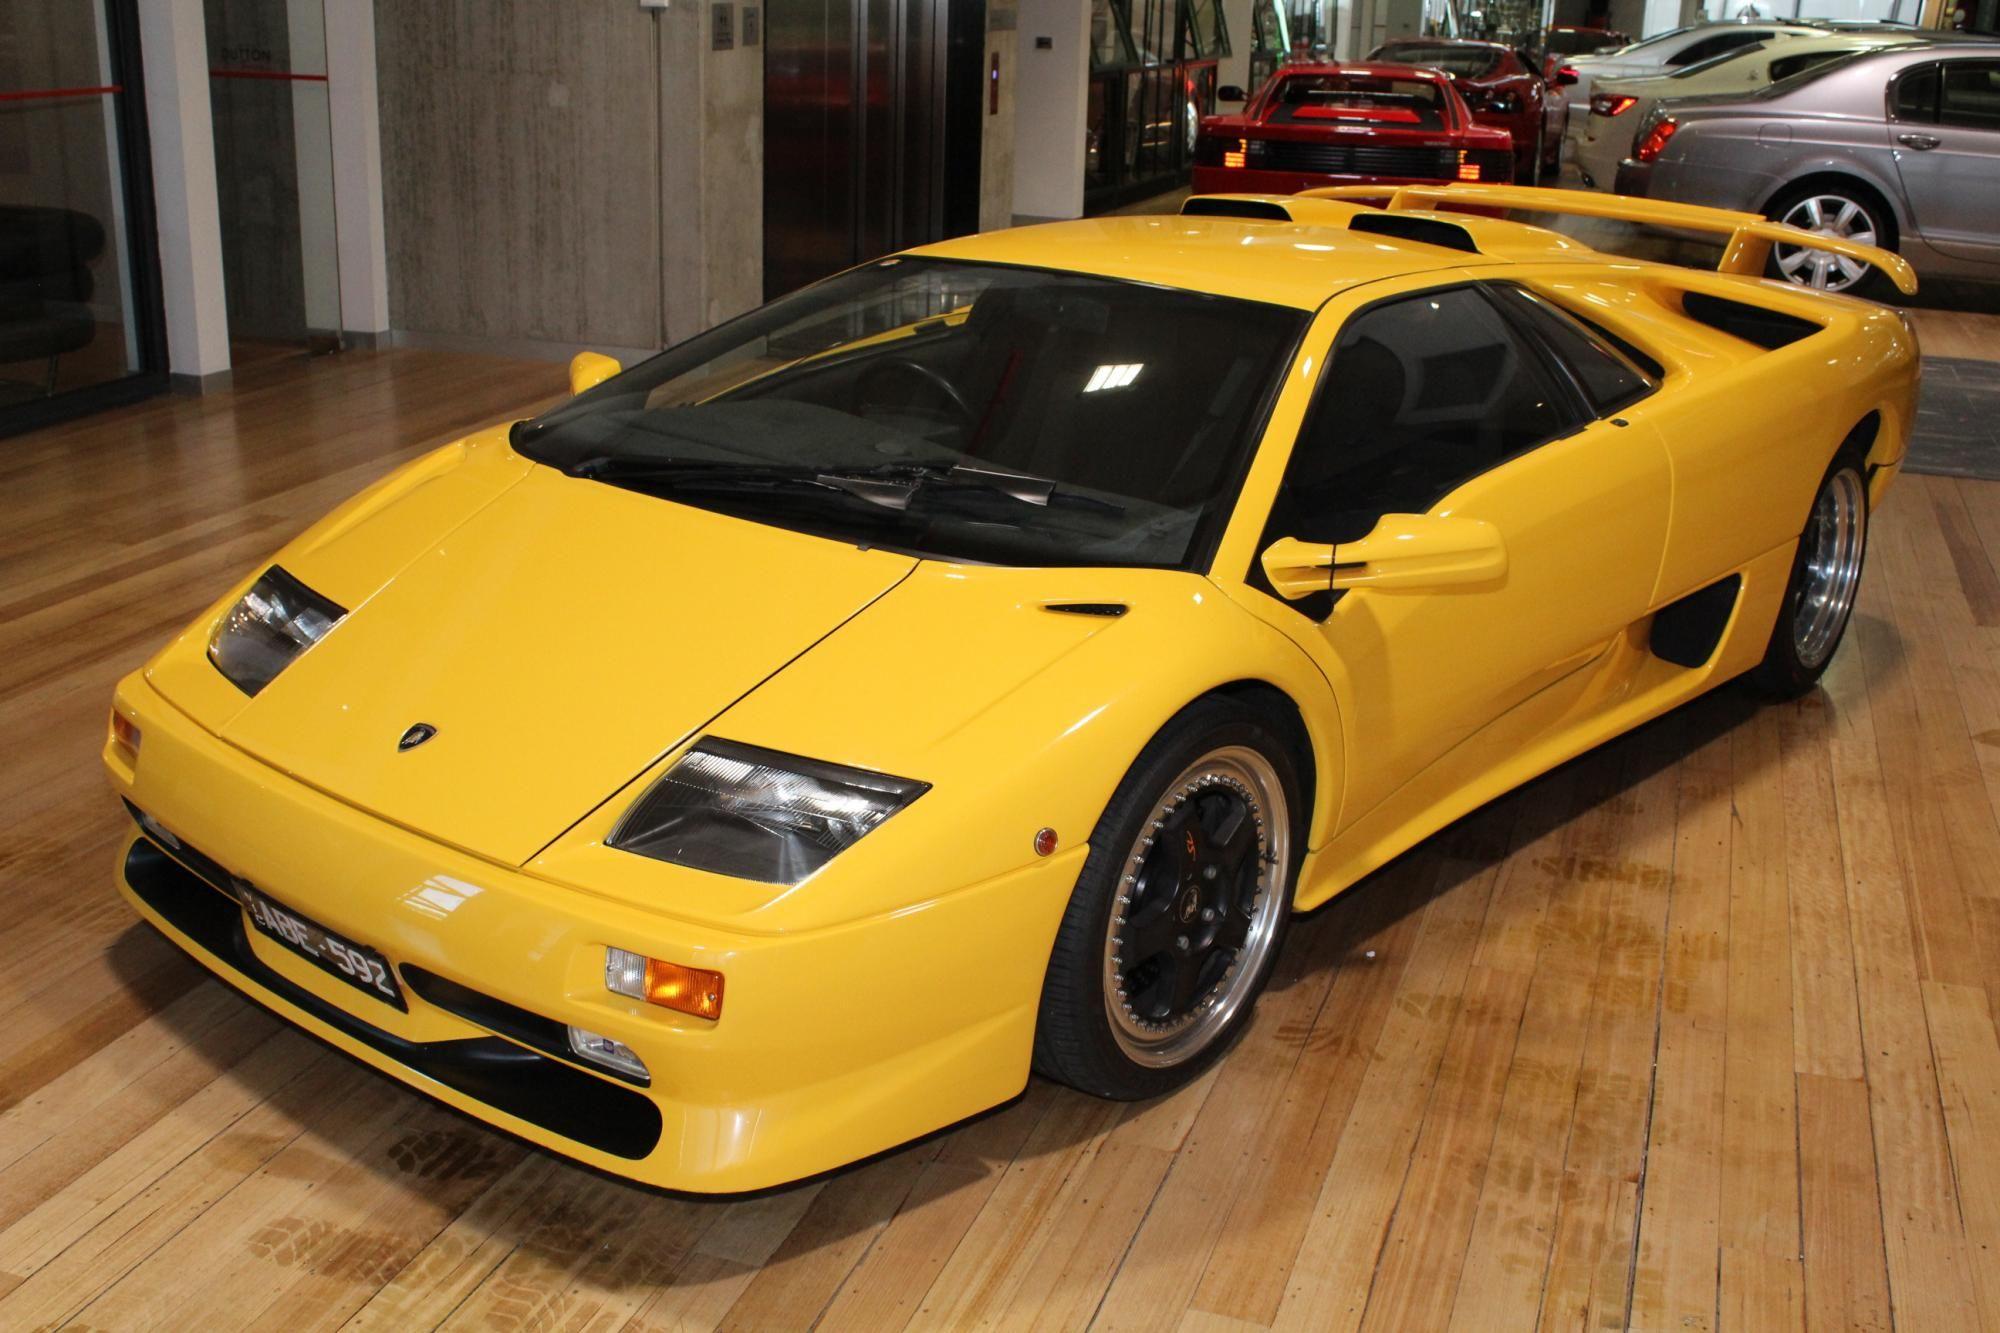 1999 Lamborghini Diablo Sv For Sale Dutton Garage Supercars